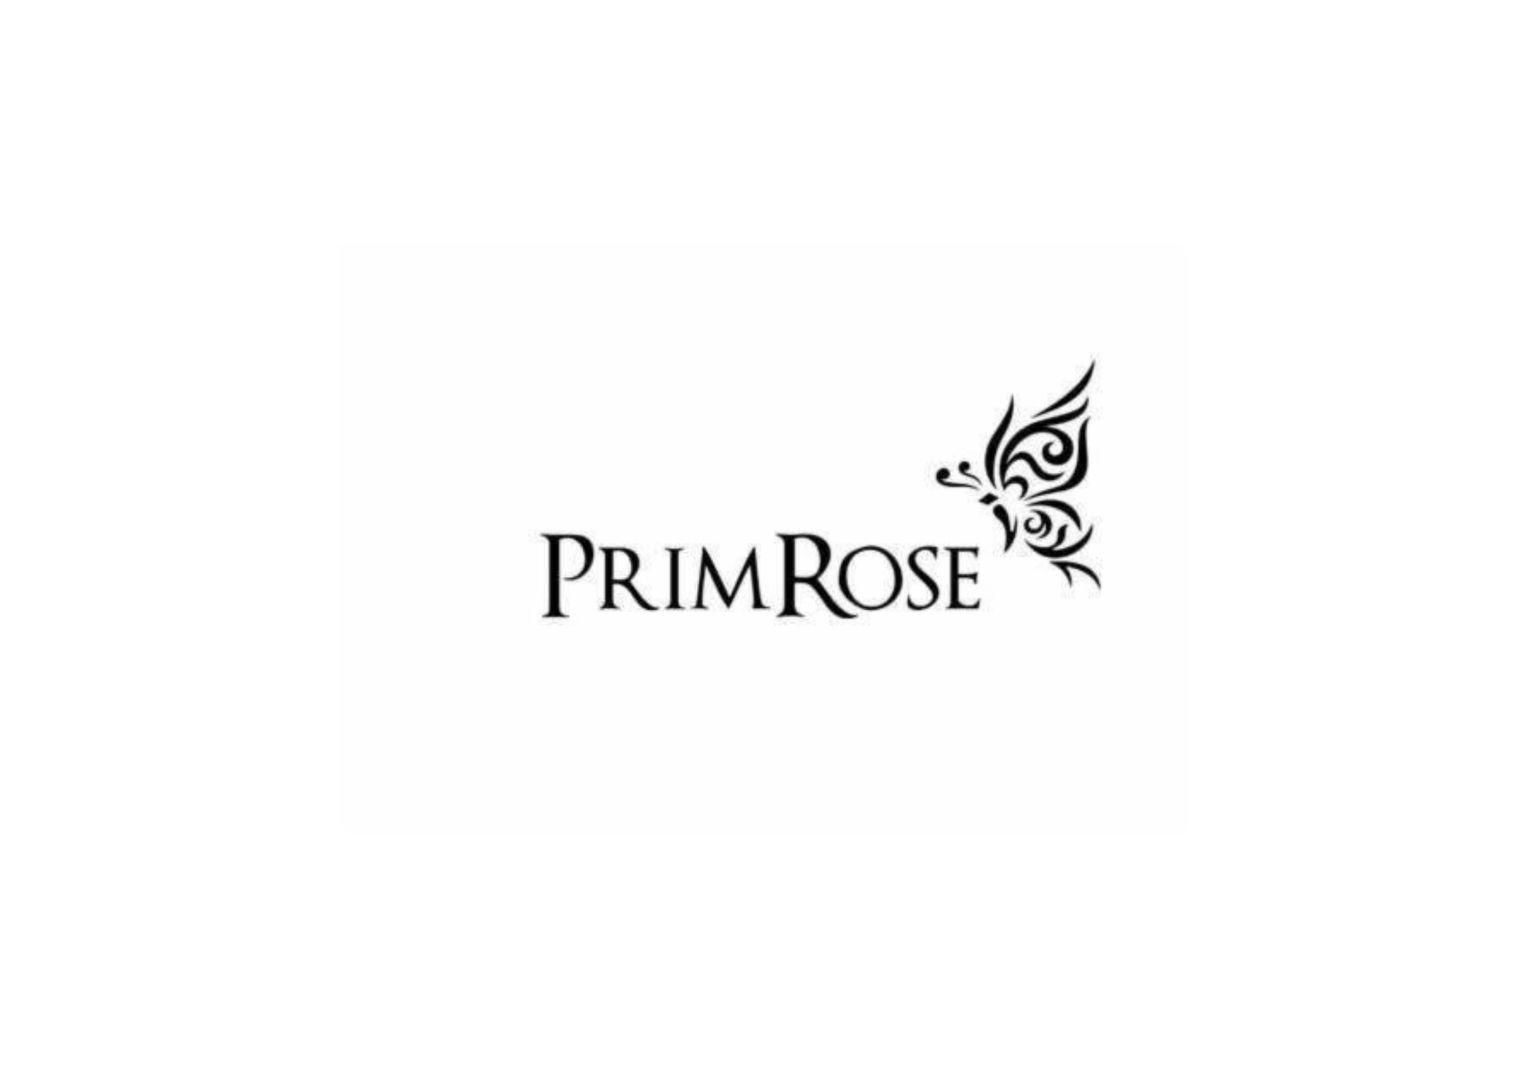 PrimRose スタッフ募集!イオンモール土浦店 / TRFT11002のカバー写真